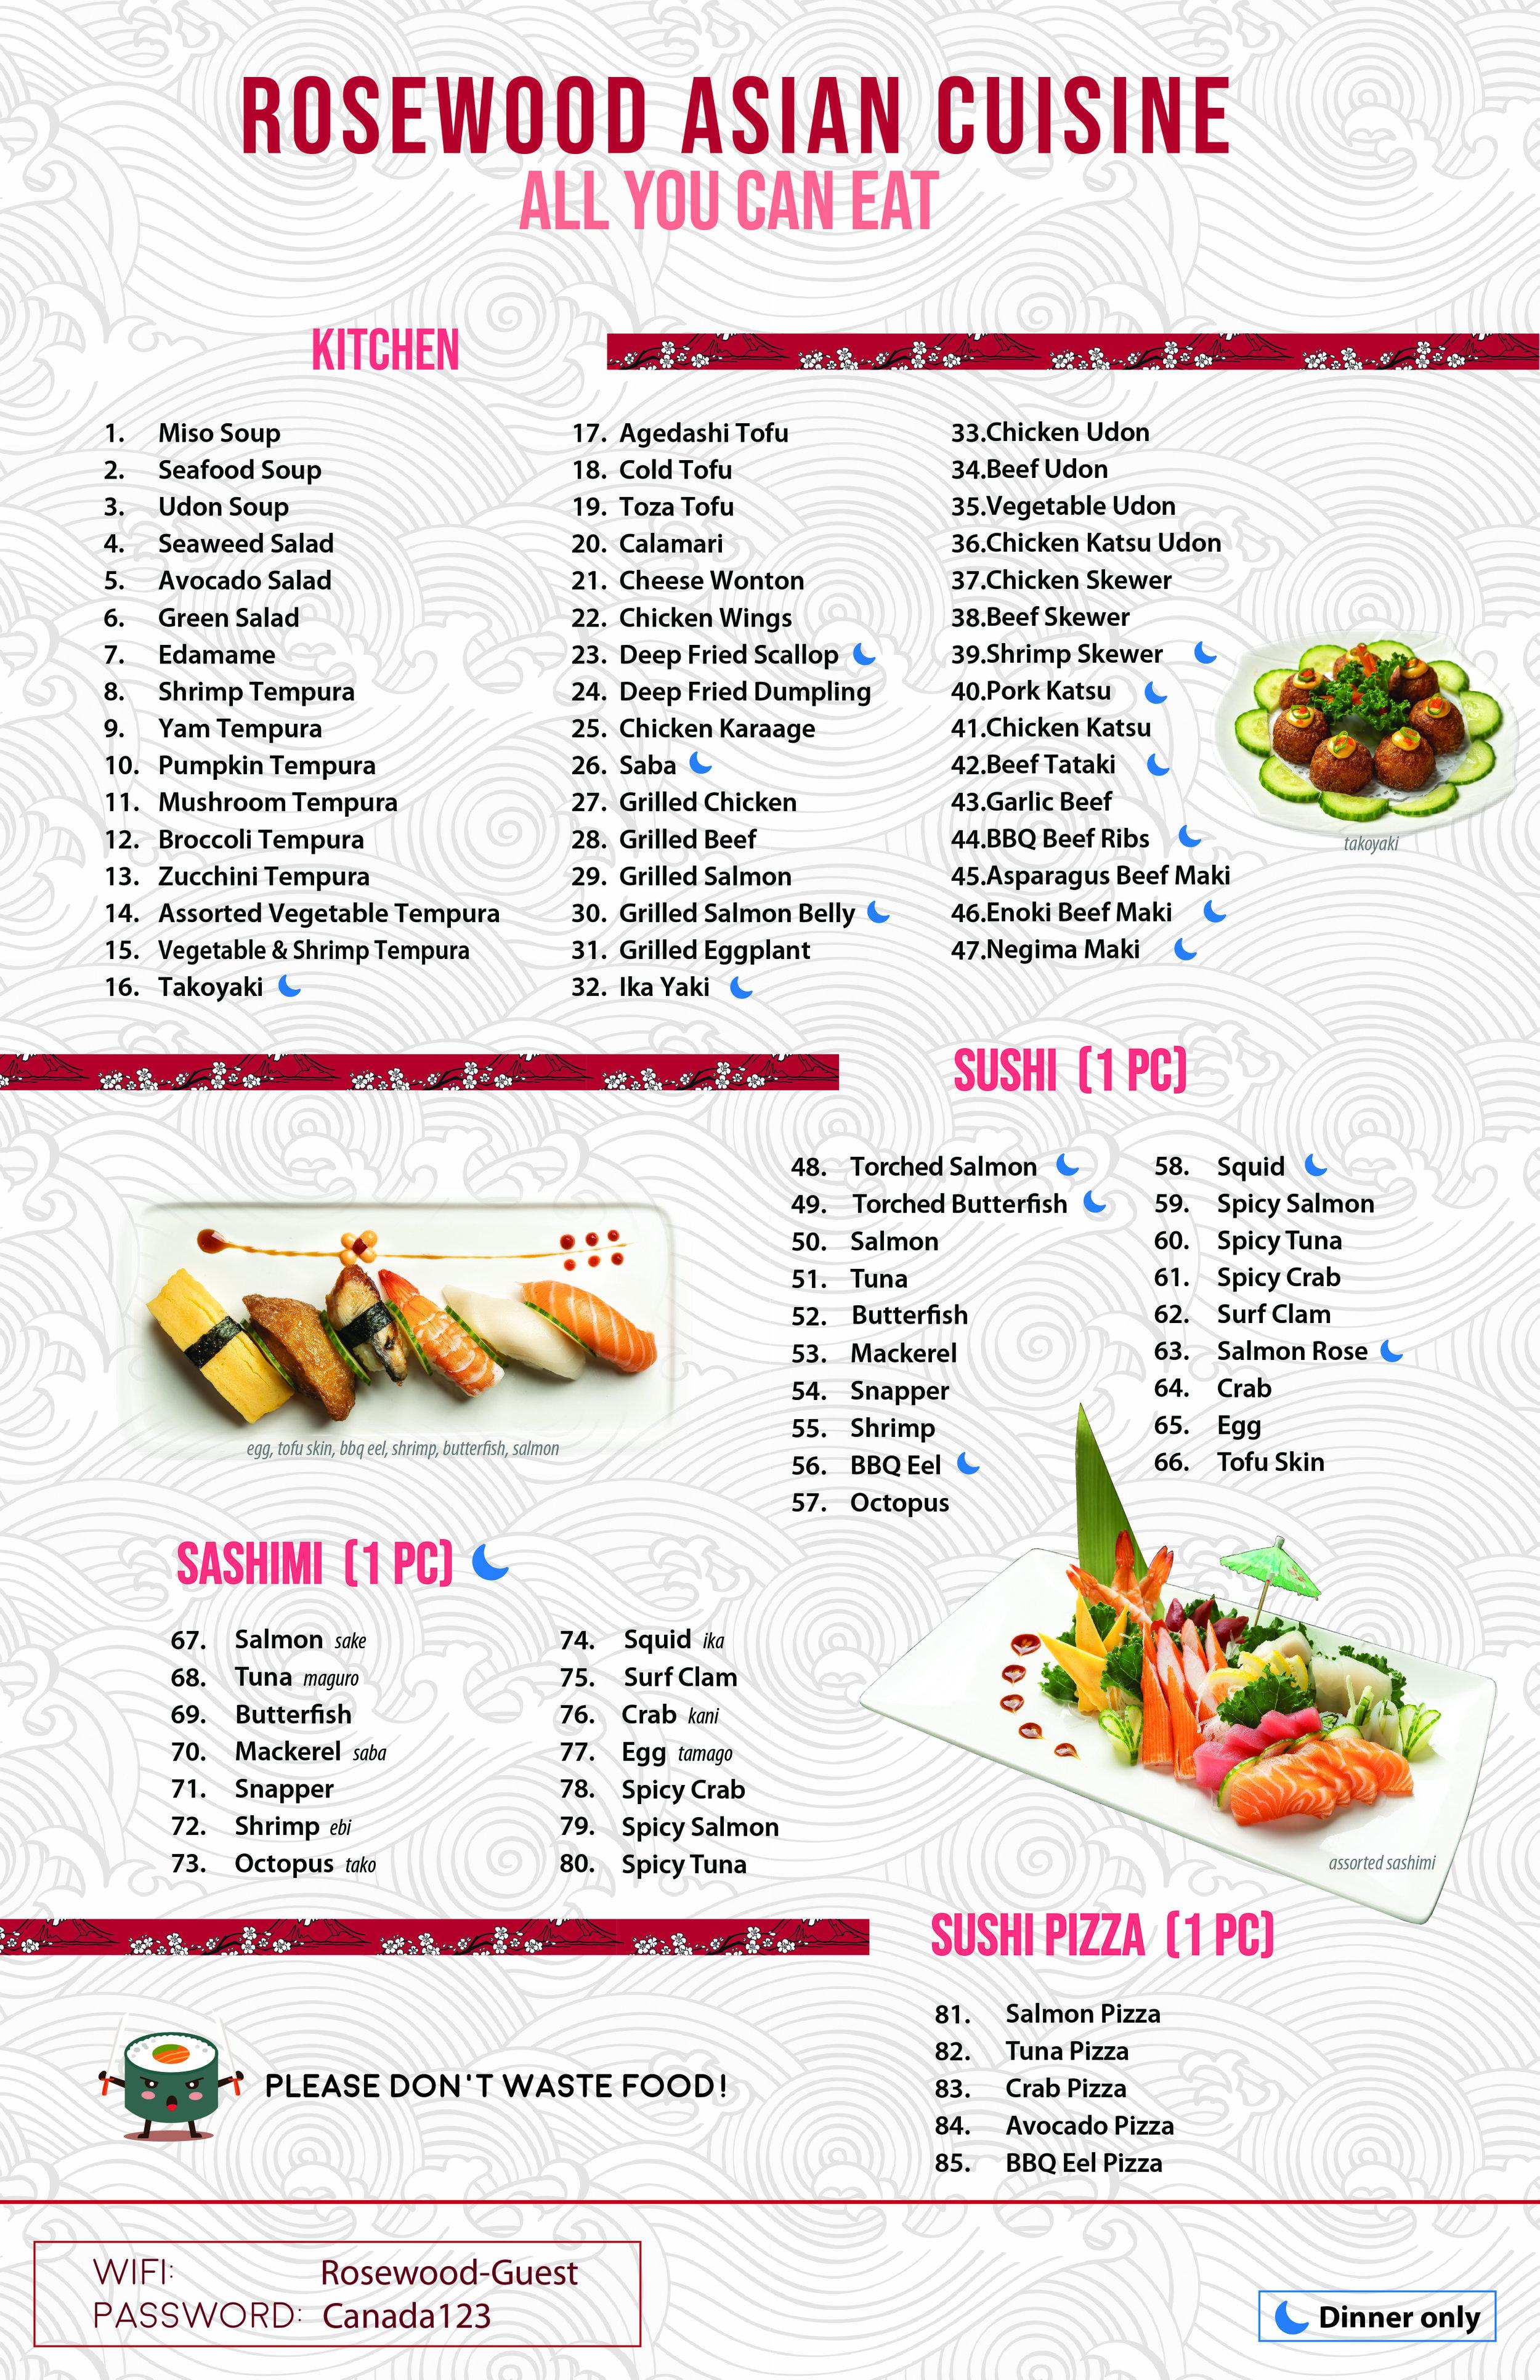 Rosewood Sushi Menu 2.0 FRONT-01.jpg